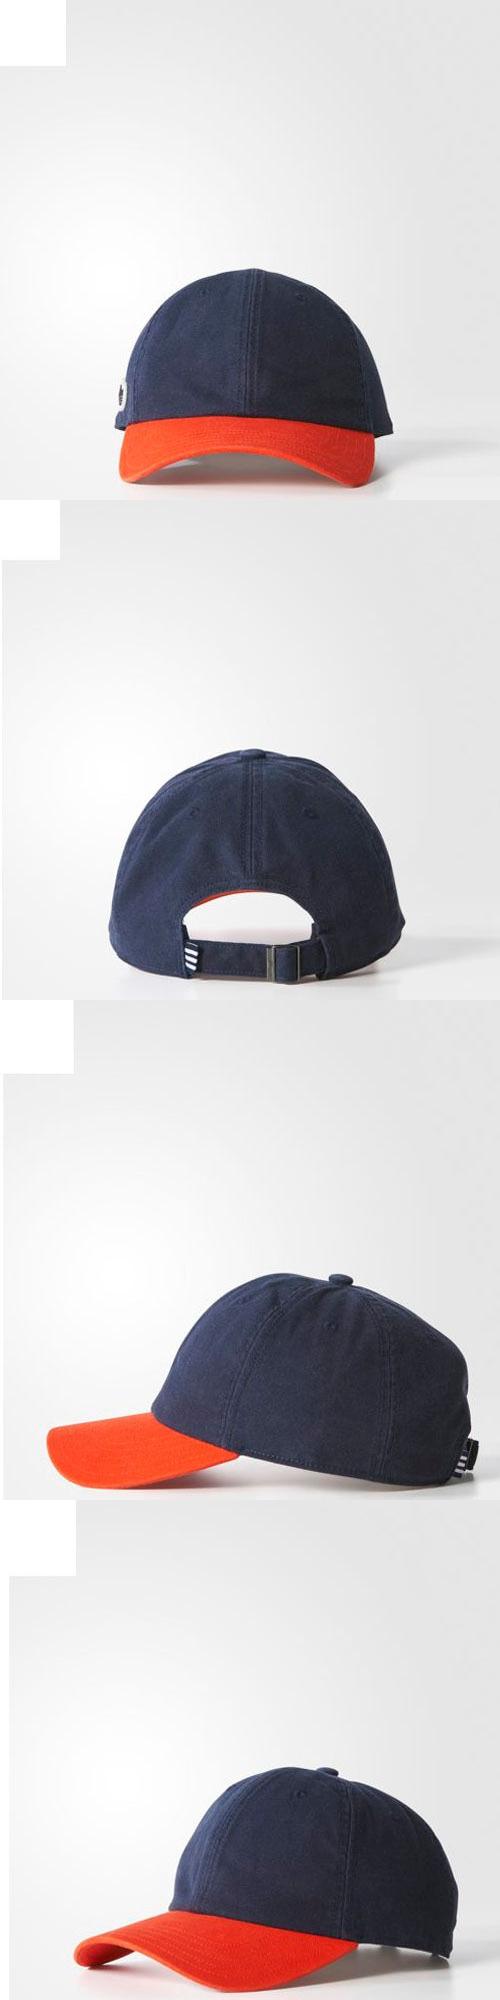 Hats and Headwear 123876  Adidas Br4829 Unisex Originals Adi Extension Cap  Navy -  BUY 91c159e0c35